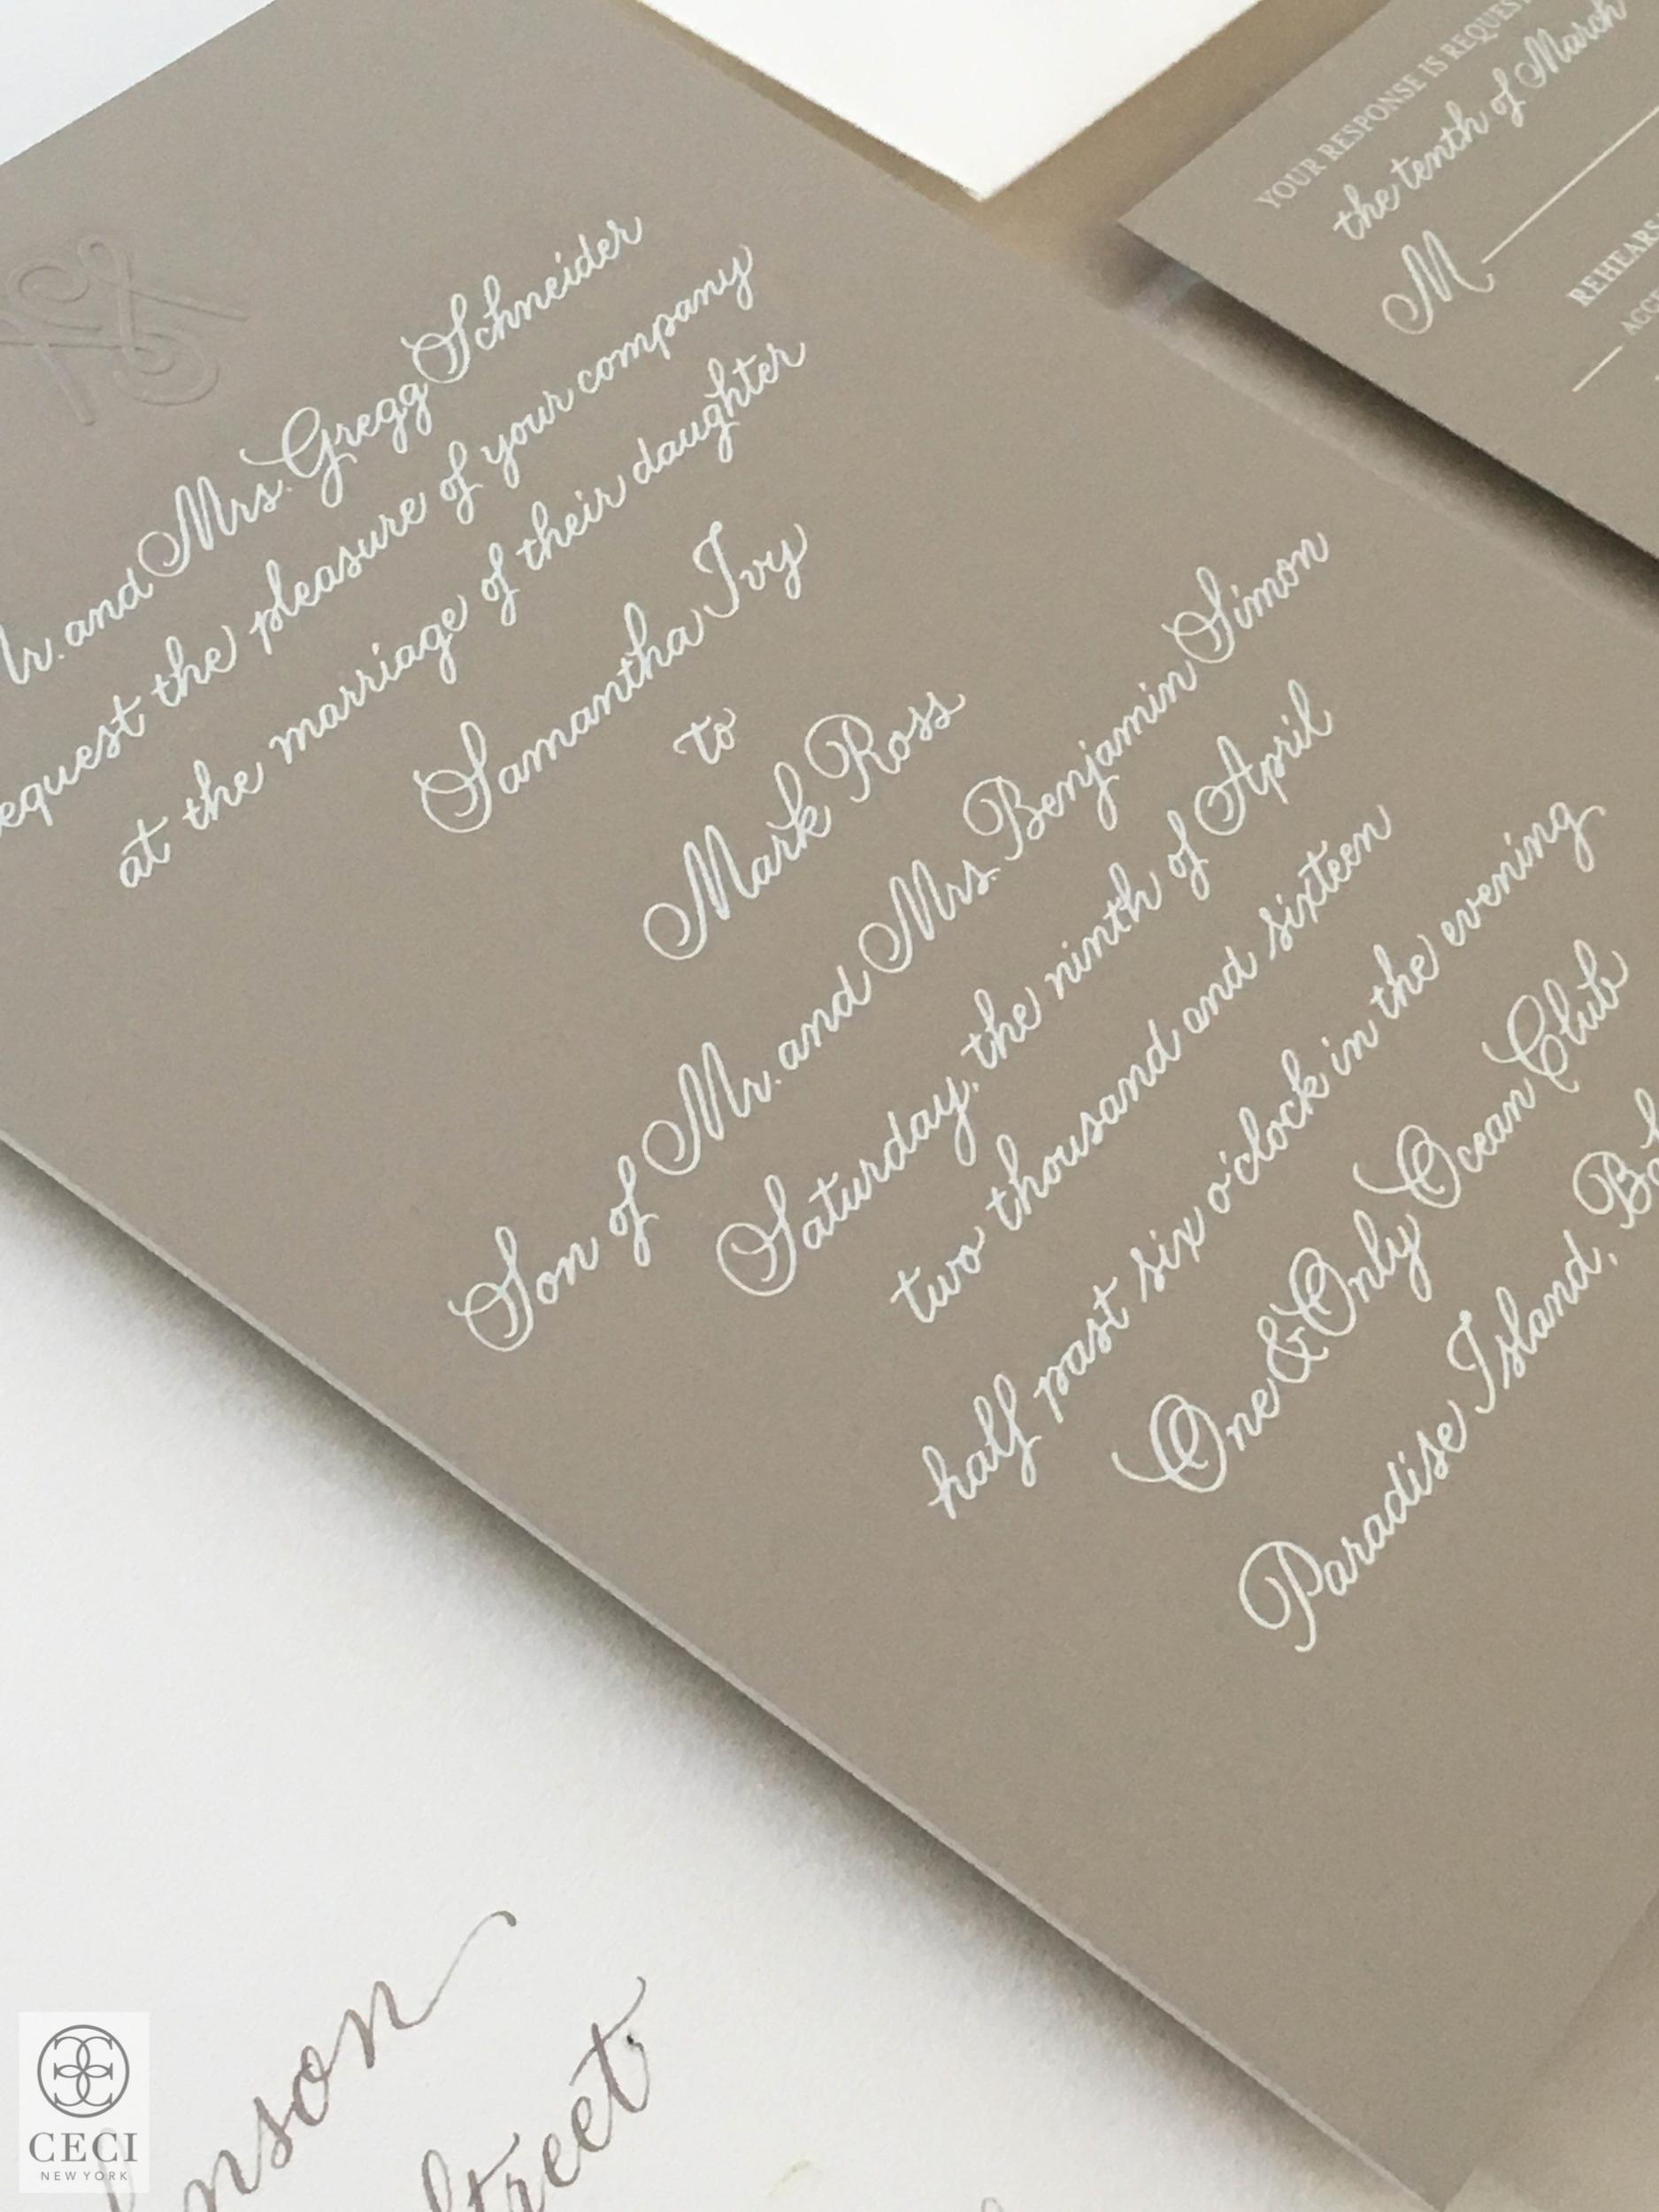 Ceci_New_York_Ceci_Style_Ceci_Johnson_Luxury_Lifestyle_Paradise_Island_Bahamas_Wedding_Engraved_Inspiration_Design_Custom_Couture_Personalized_Invitations_--6.jpg